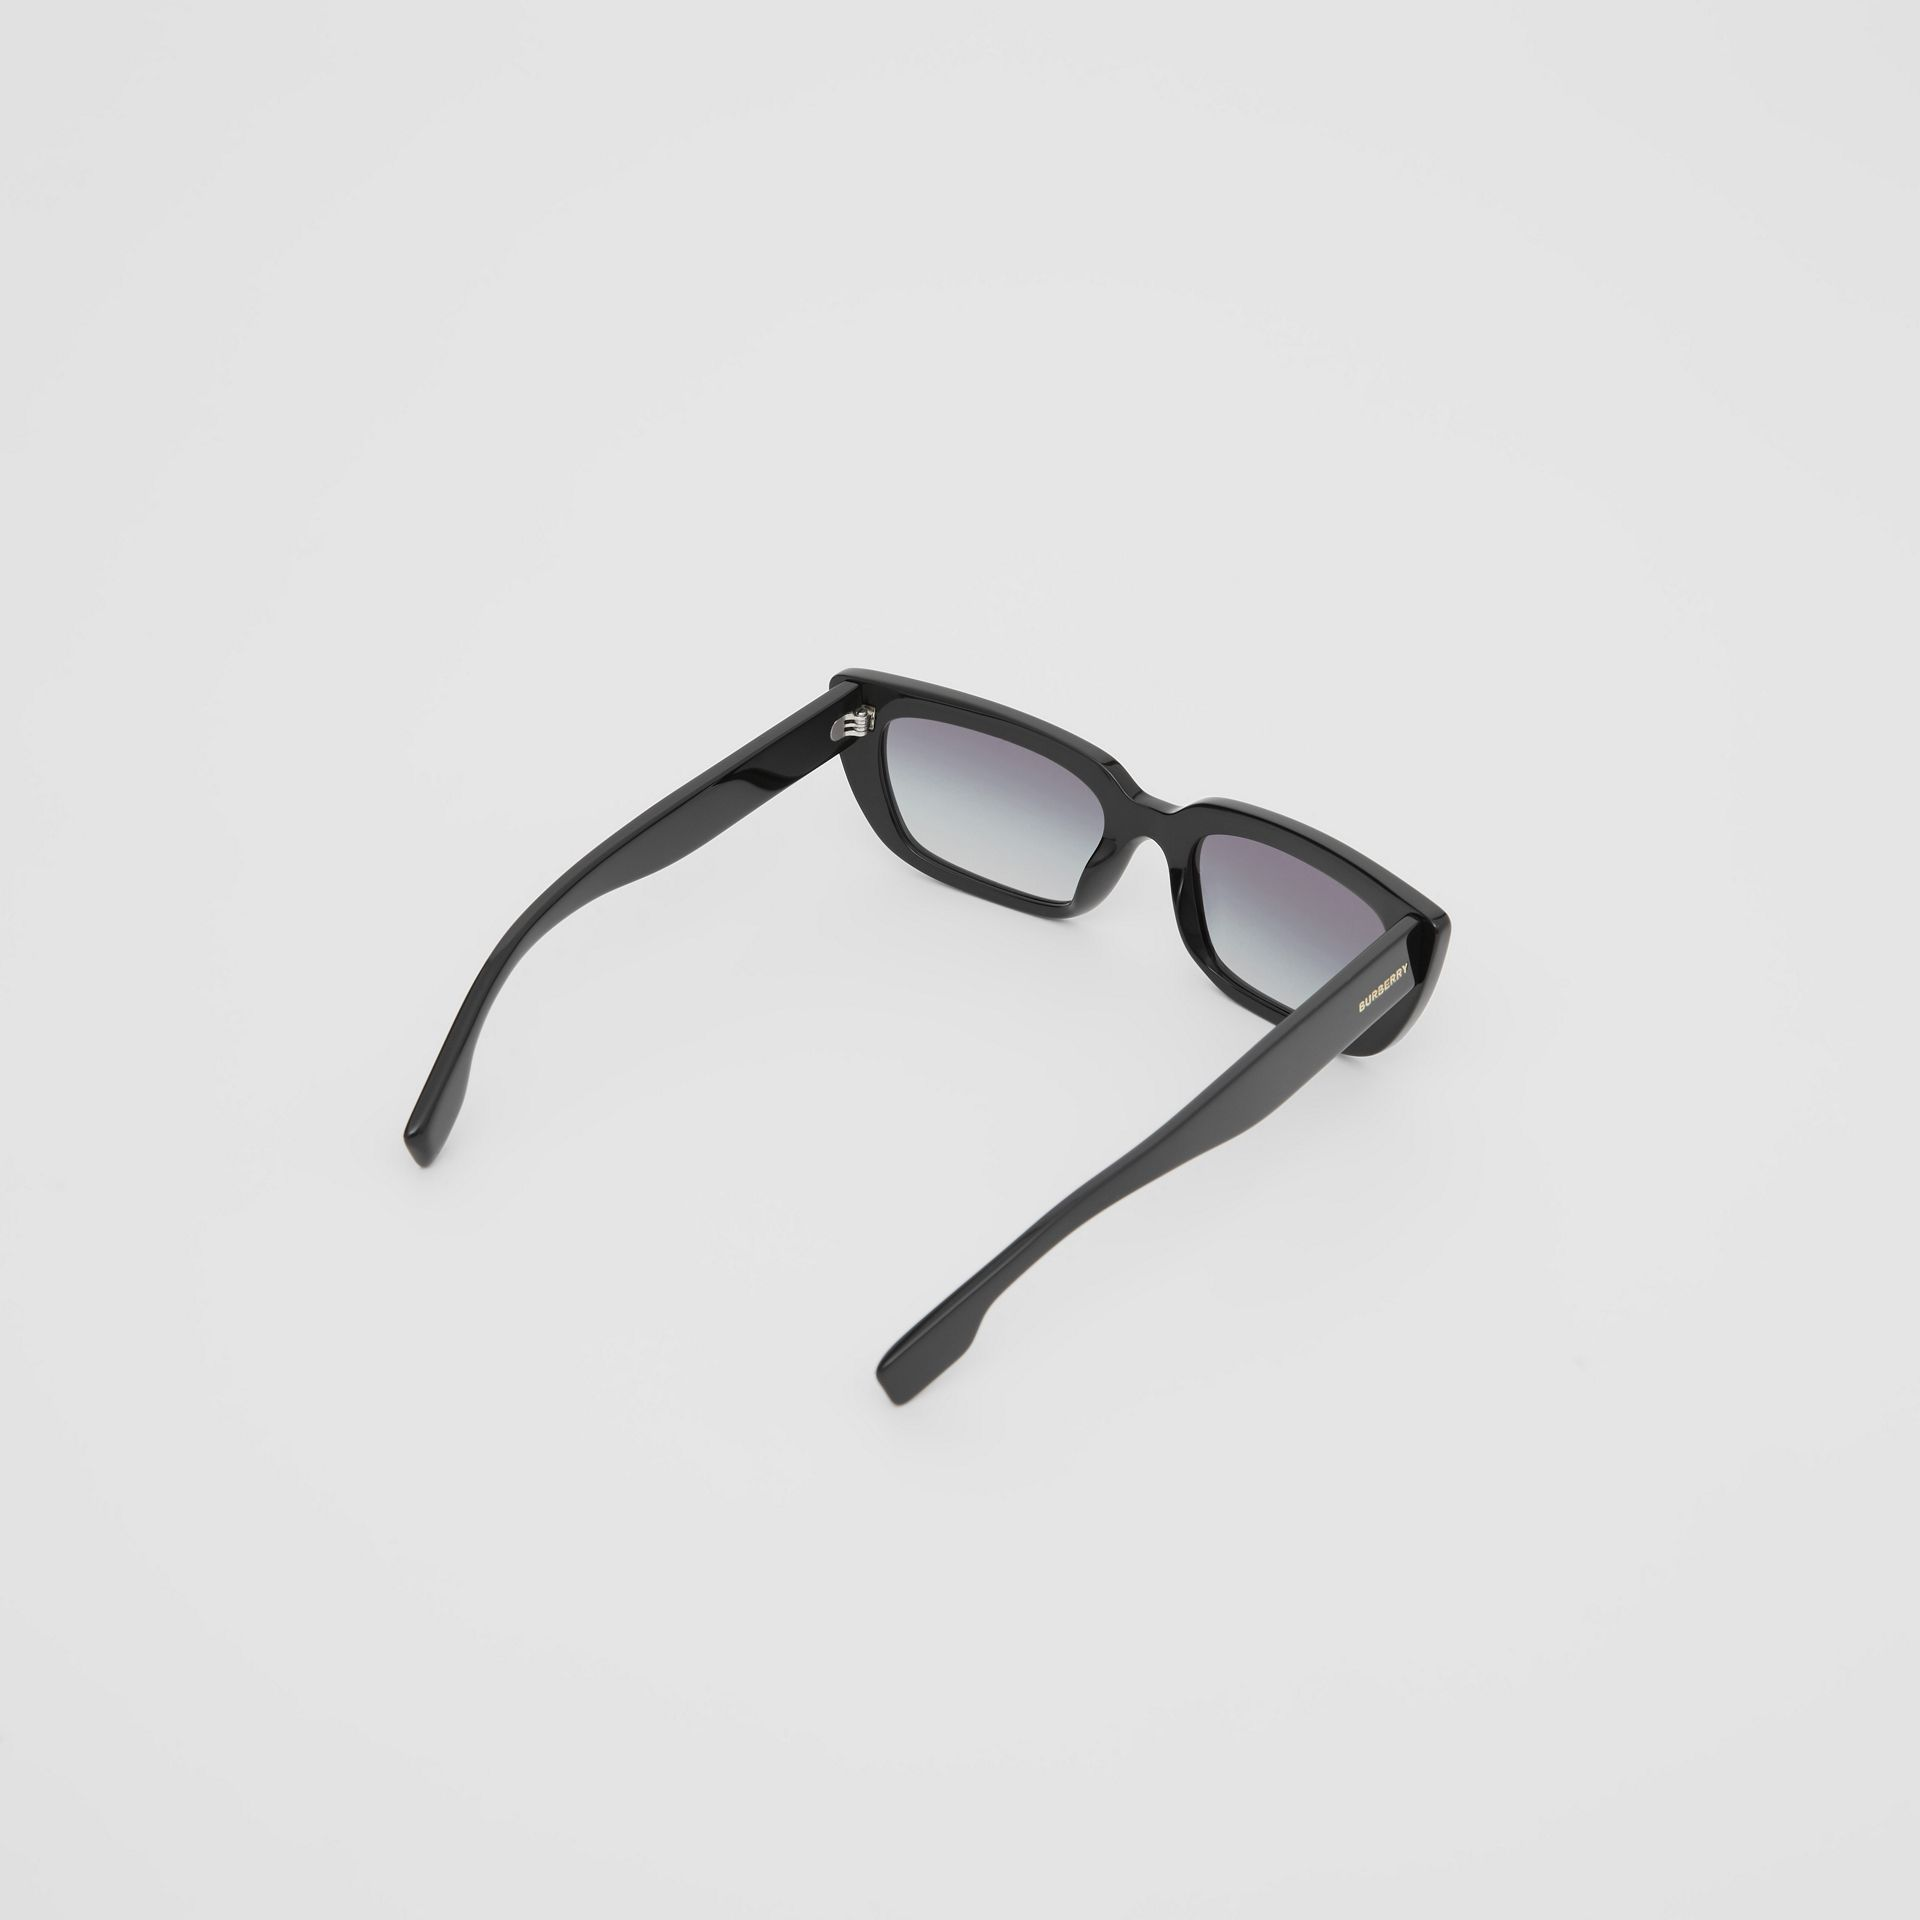 Bio-acetate Rectangular Frame Sunglasses in Black - Women | Burberry United Kingdom - gallery image 4